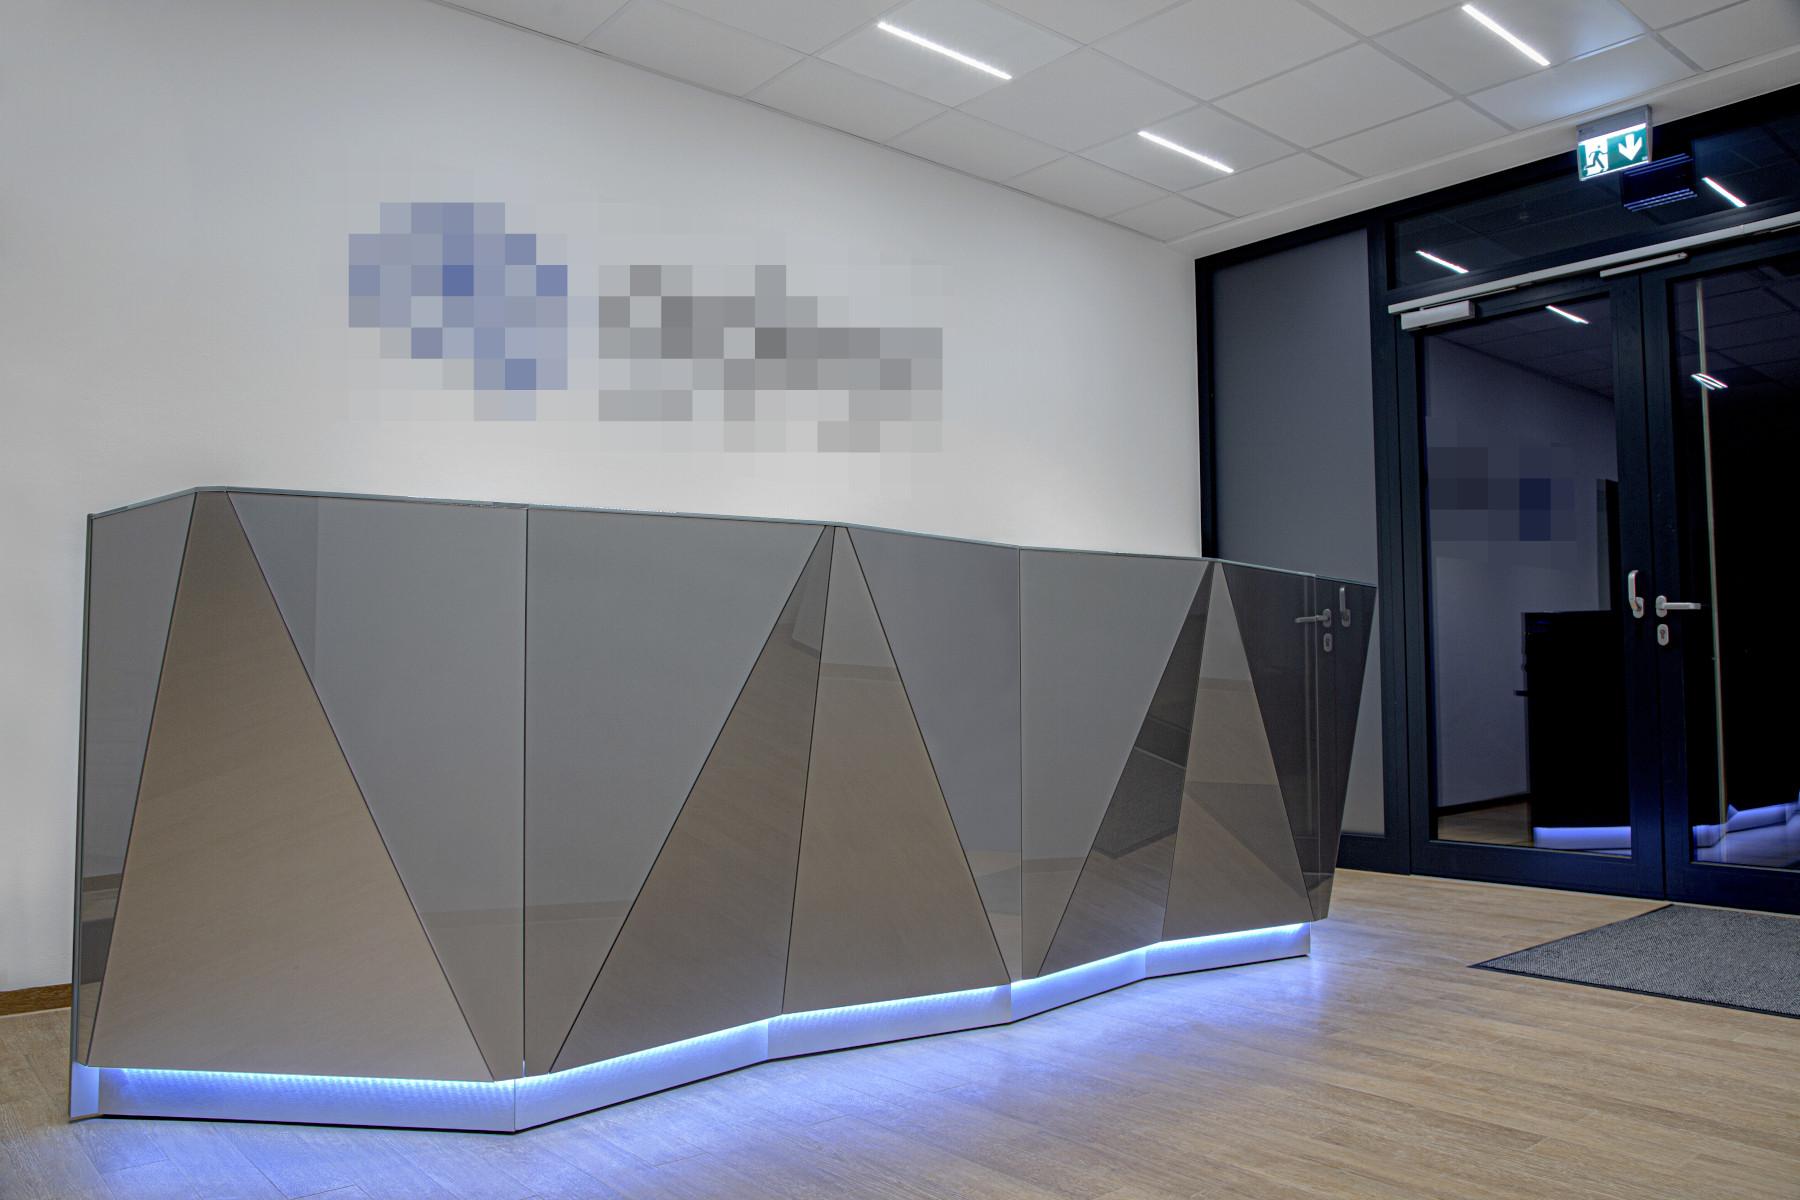 Futuristisches Design meets High Tech